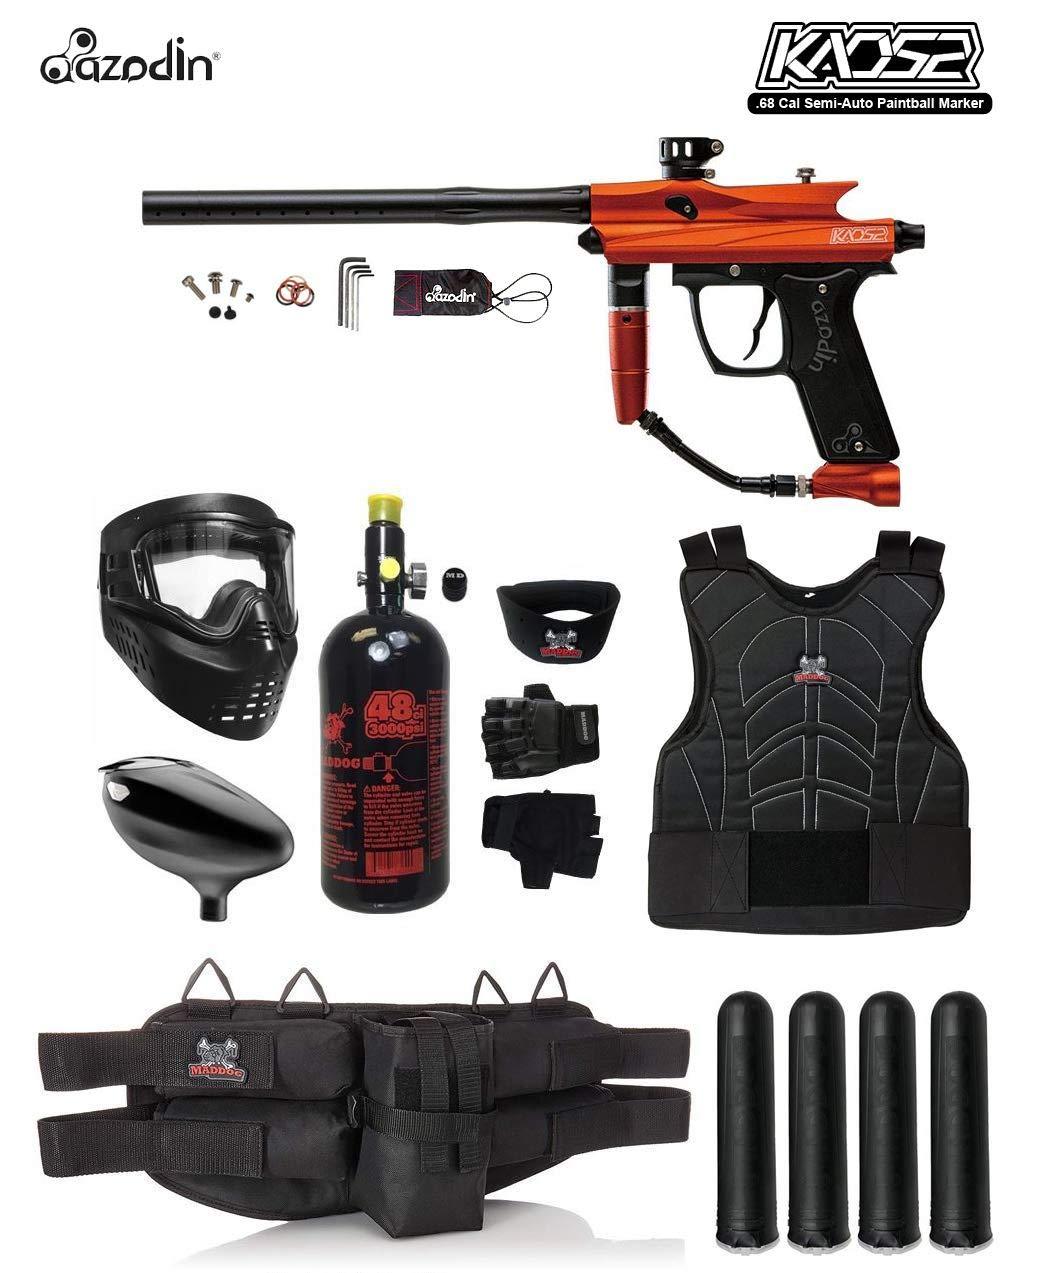 MAddog Azodin KAOS 2 Starter Protective HPA Paintball Gun Package - Orange/Black